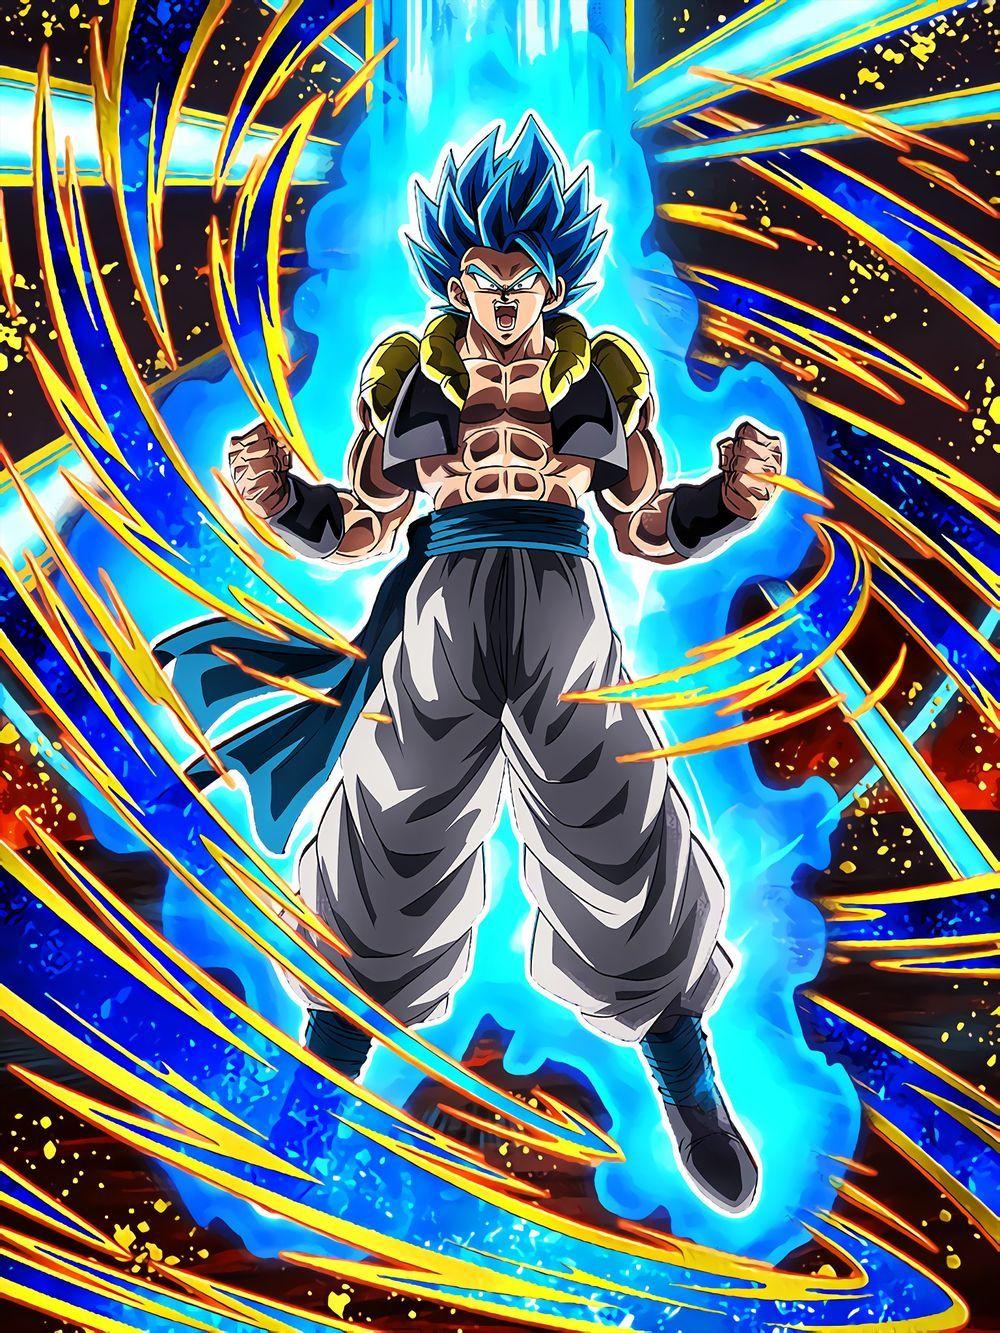 Transcendent Fusion Super Saiyan Gogeta Dragon Ball Z Dokkan Battle Wikia Fandom Pow Anime Dragon Ball Super Dragon Ball Wallpapers Dragon Ball Super Manga